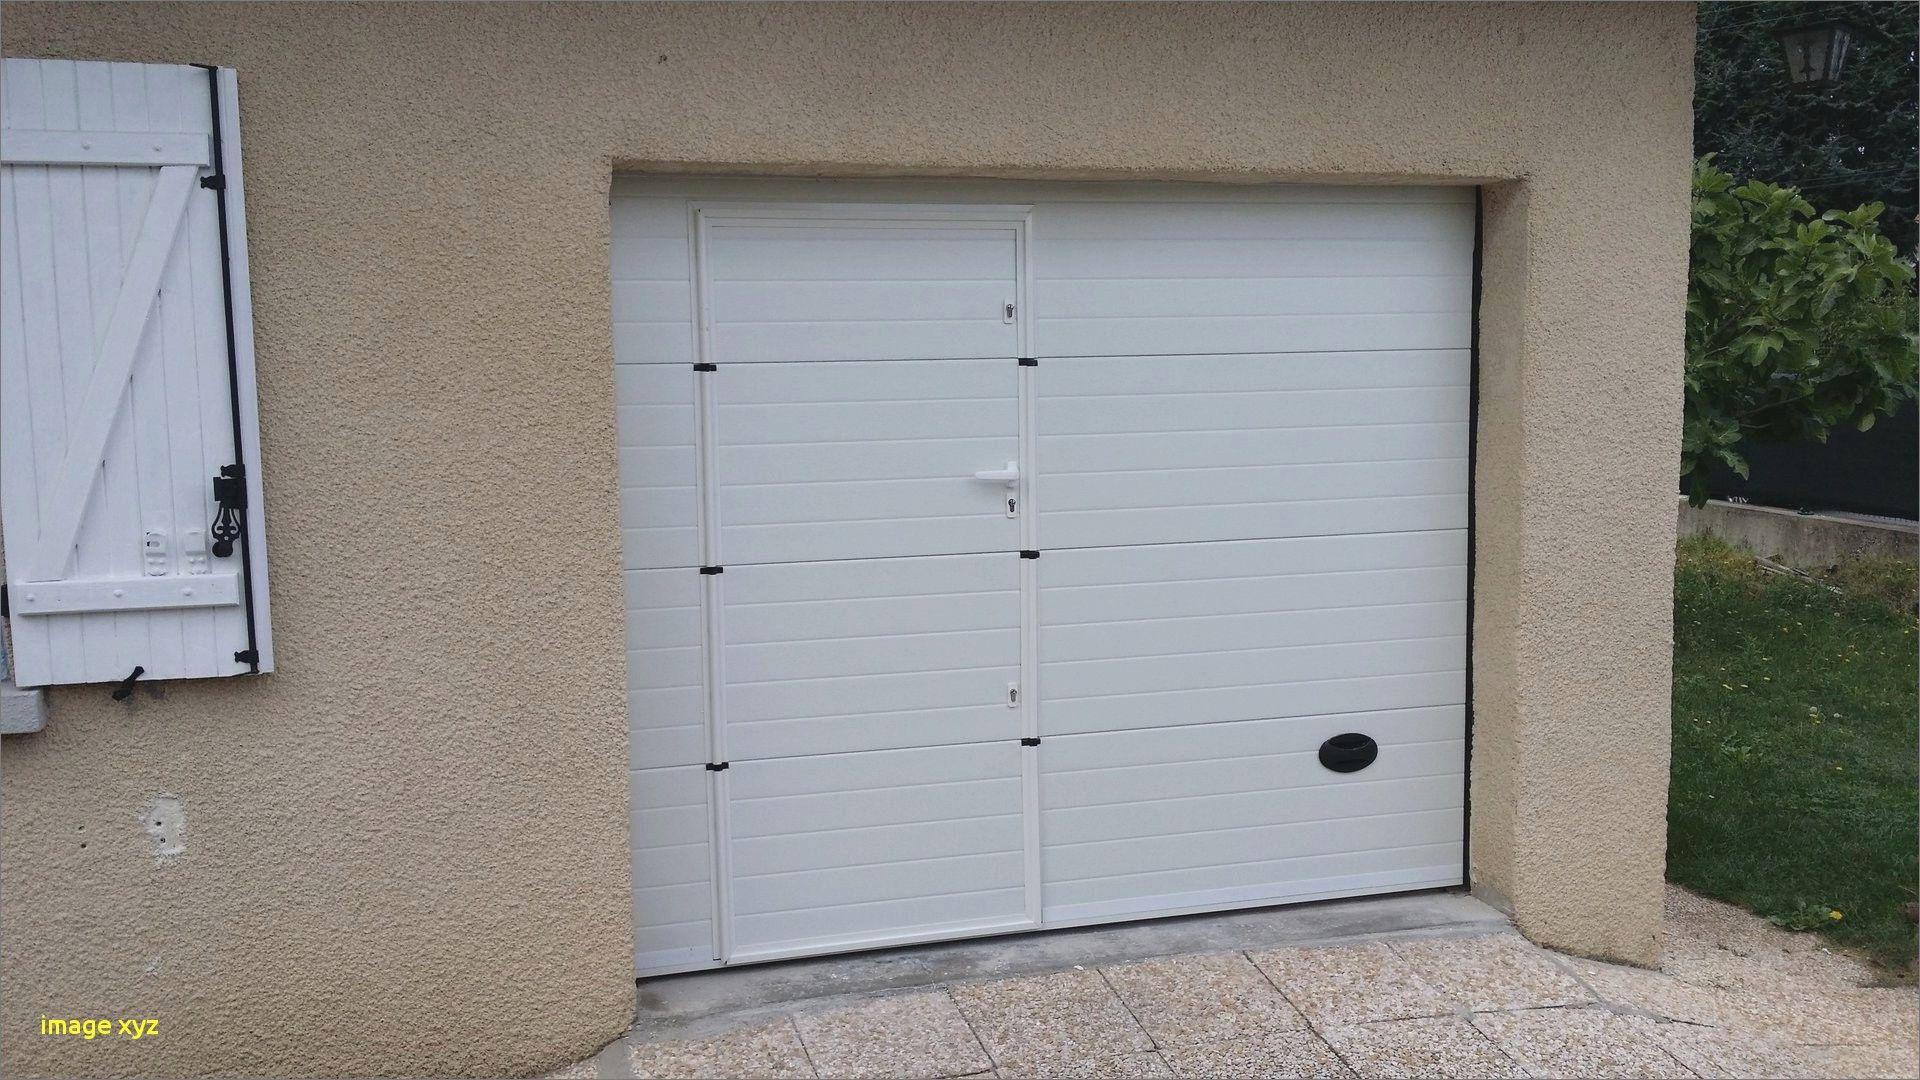 Best Of Porte De Garage Sectionnelle Motorisee Brico Depot Garage Doors Garage Cuisine Design